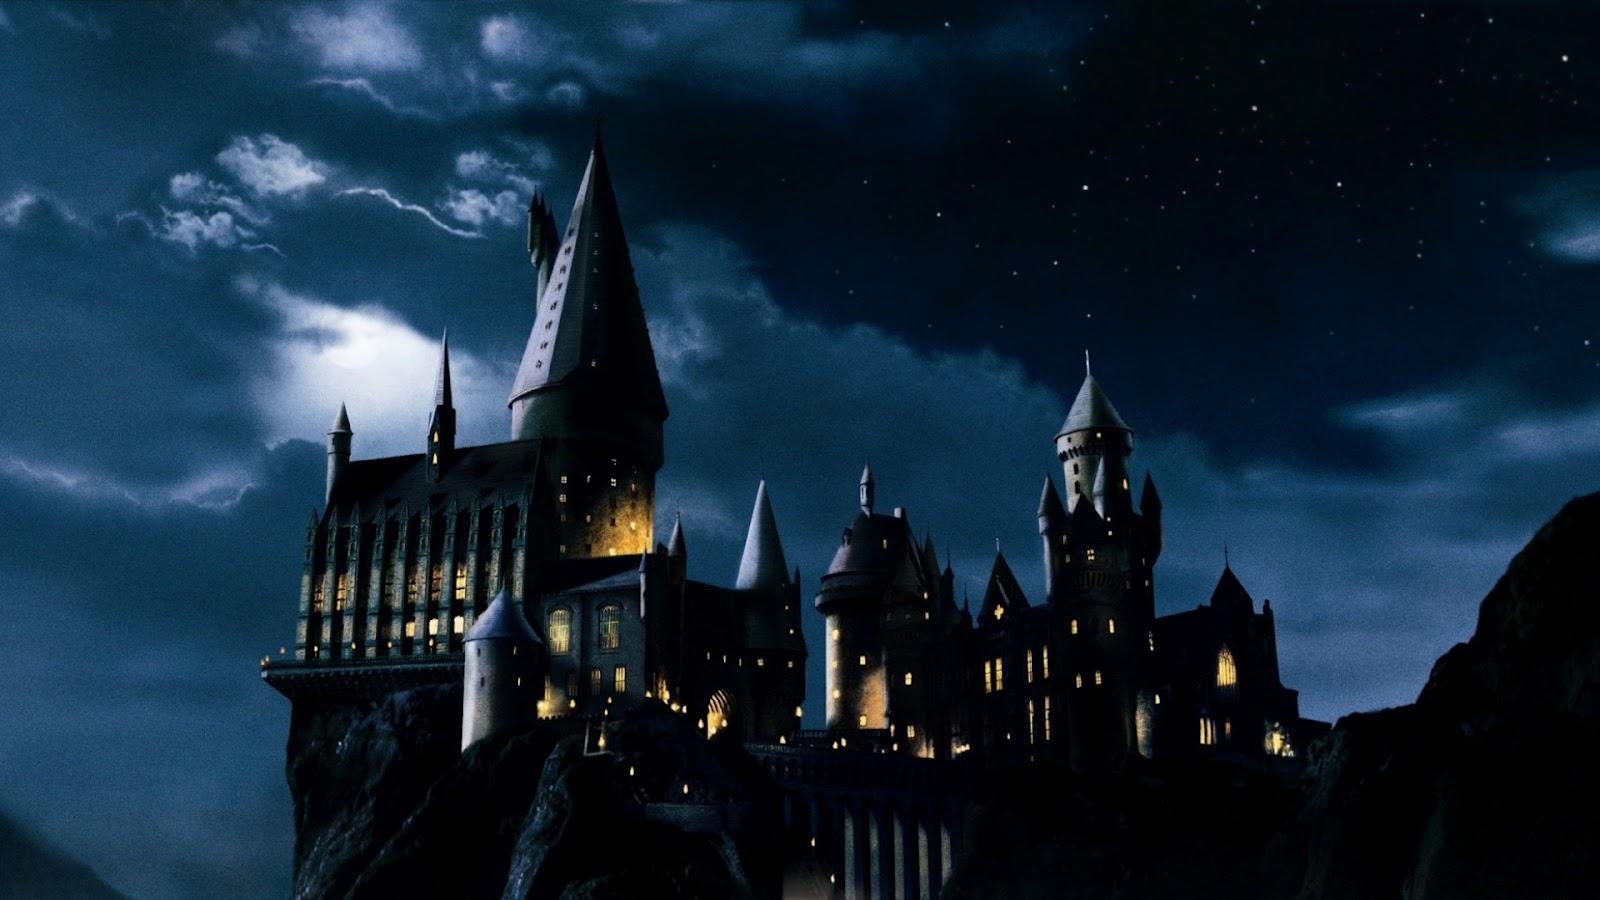 Harry Potter Hogwarts Desktop 1920x1080 Hd Wallpaper 674094 Jpg